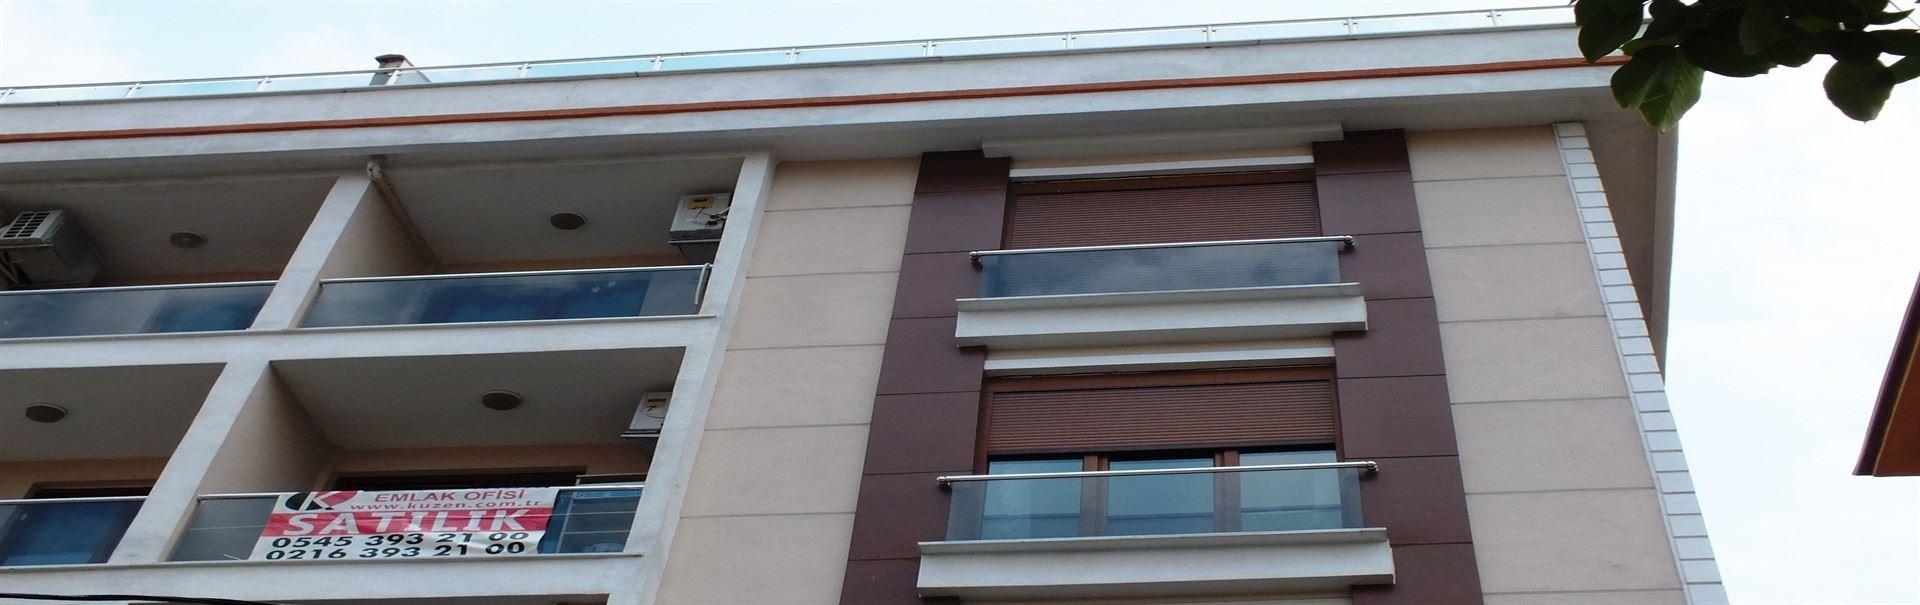 Yeni Binada 110 m2 3+1 Arakat Daire